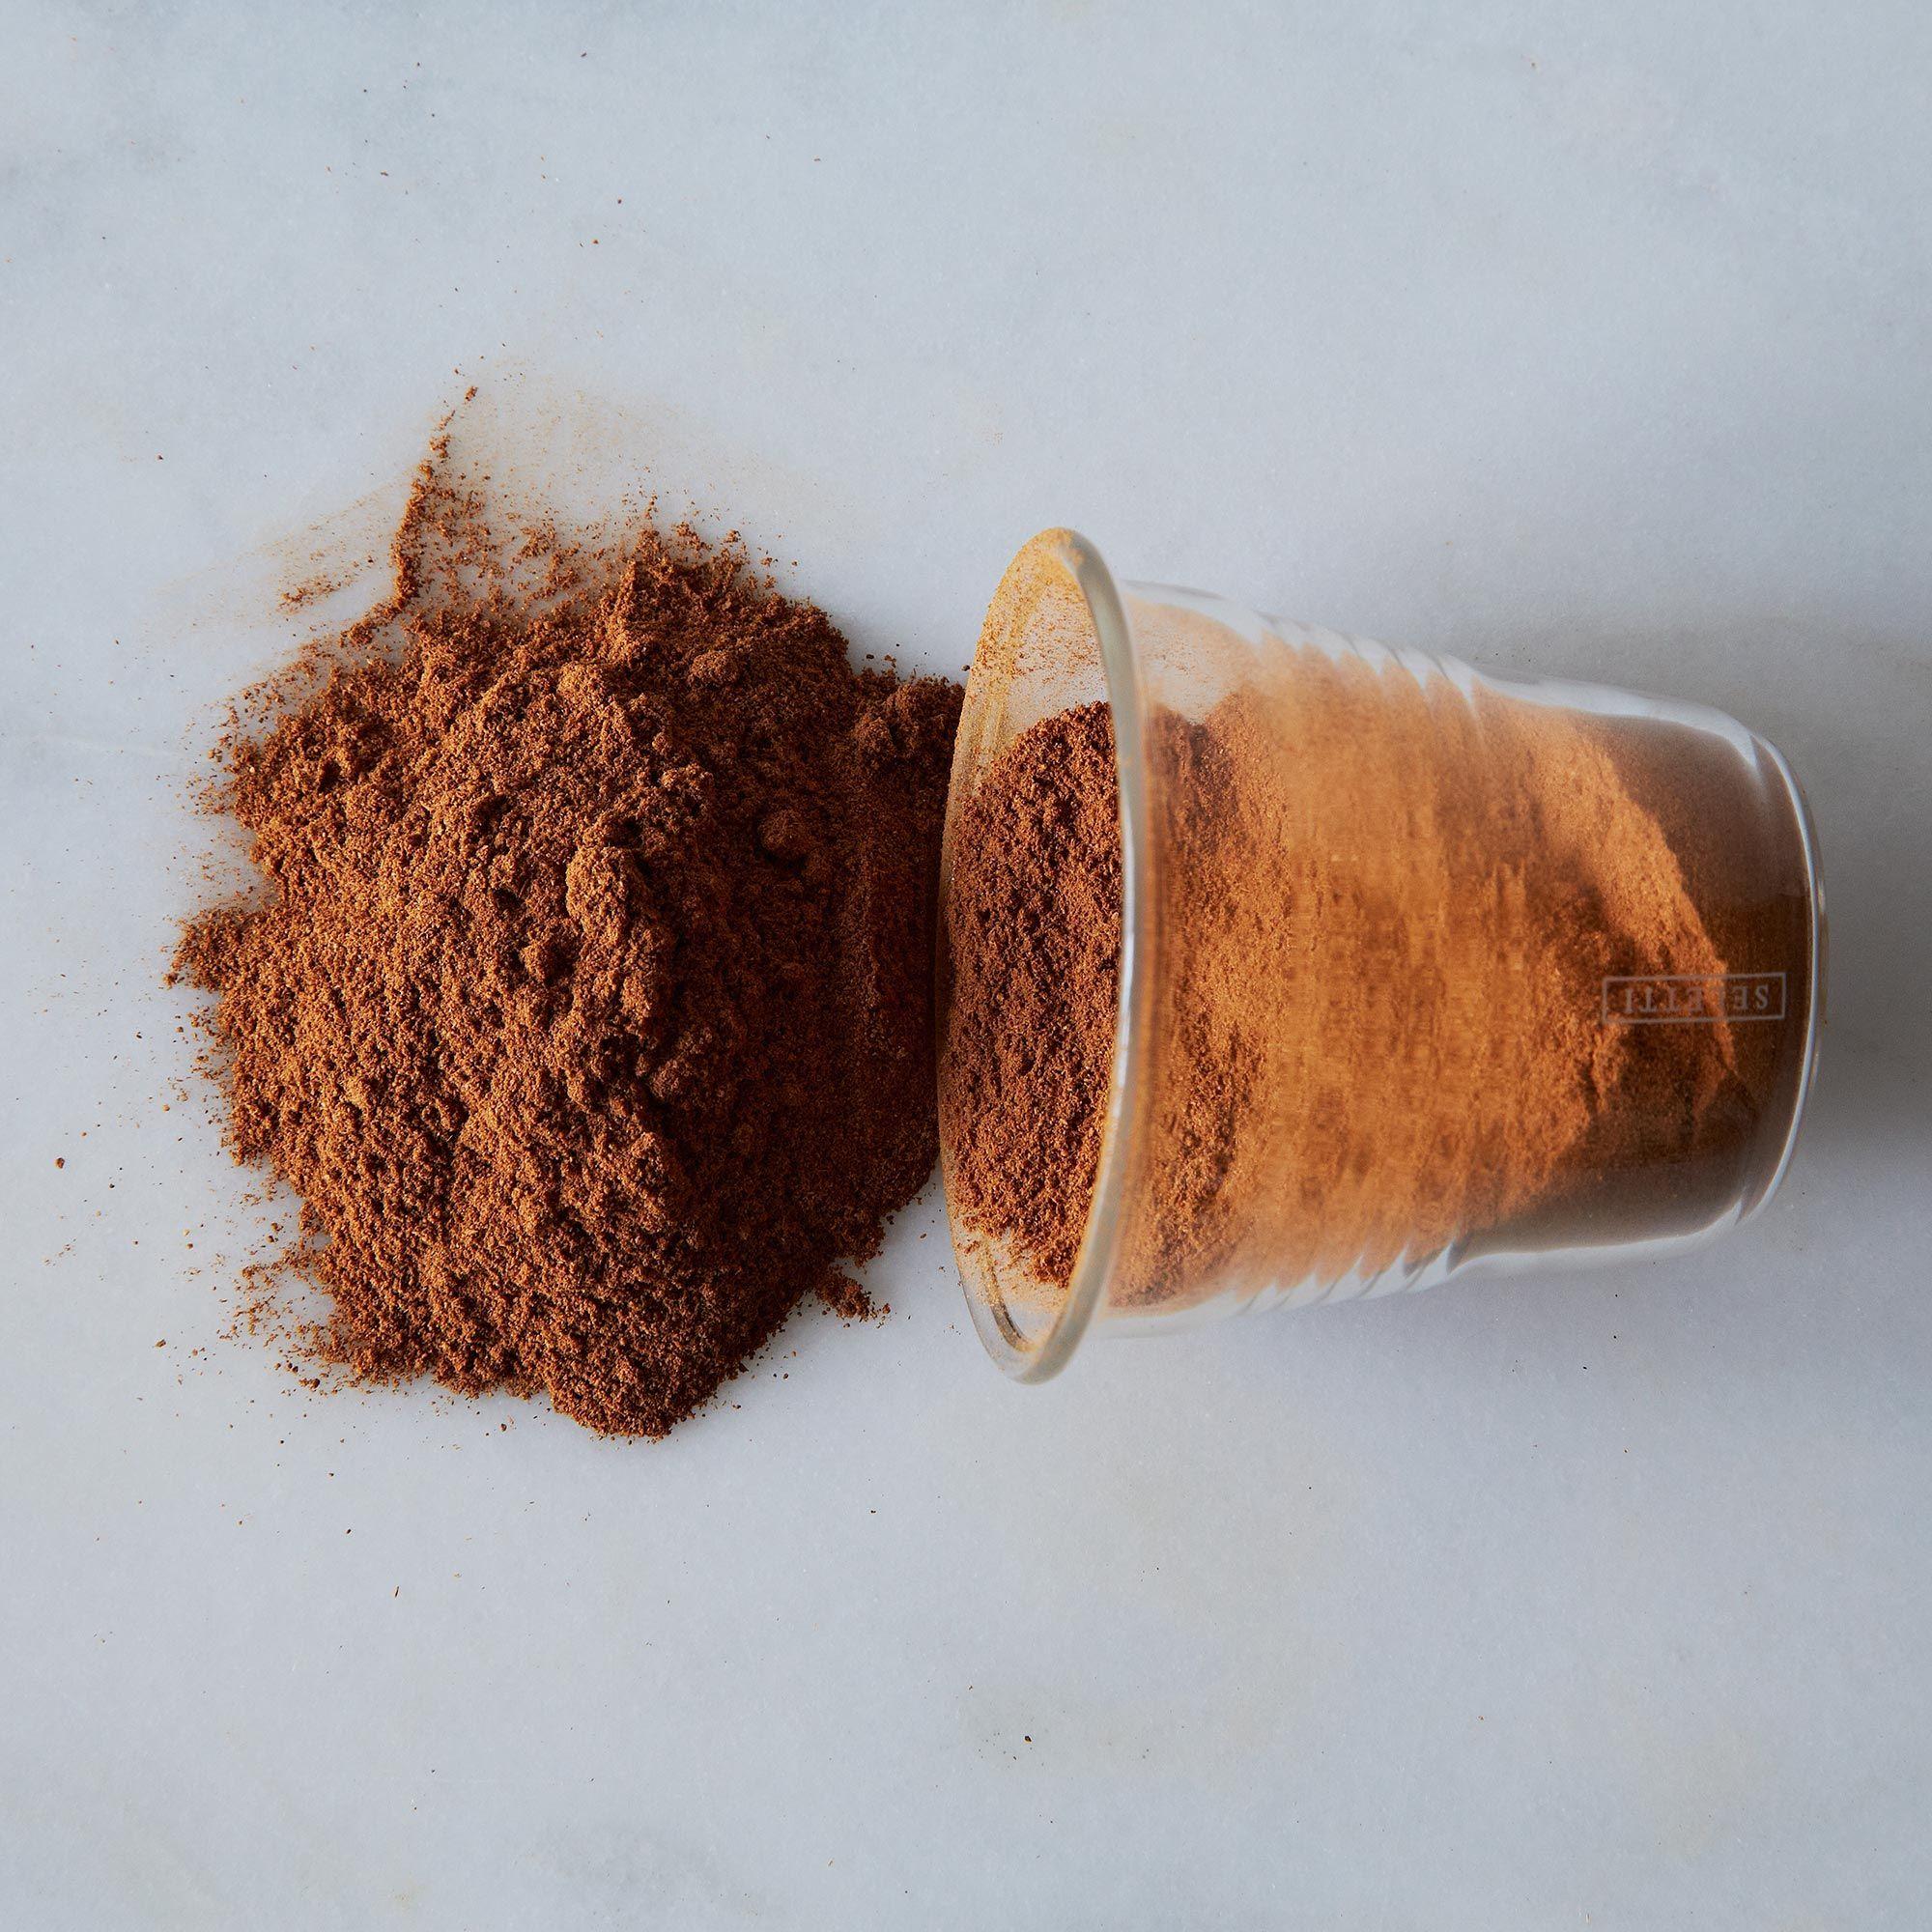 18f242ad 20c9 42e2 91b6 ea36f12eab20  2013 0710 oaktown spice shop cinnamon mid 093